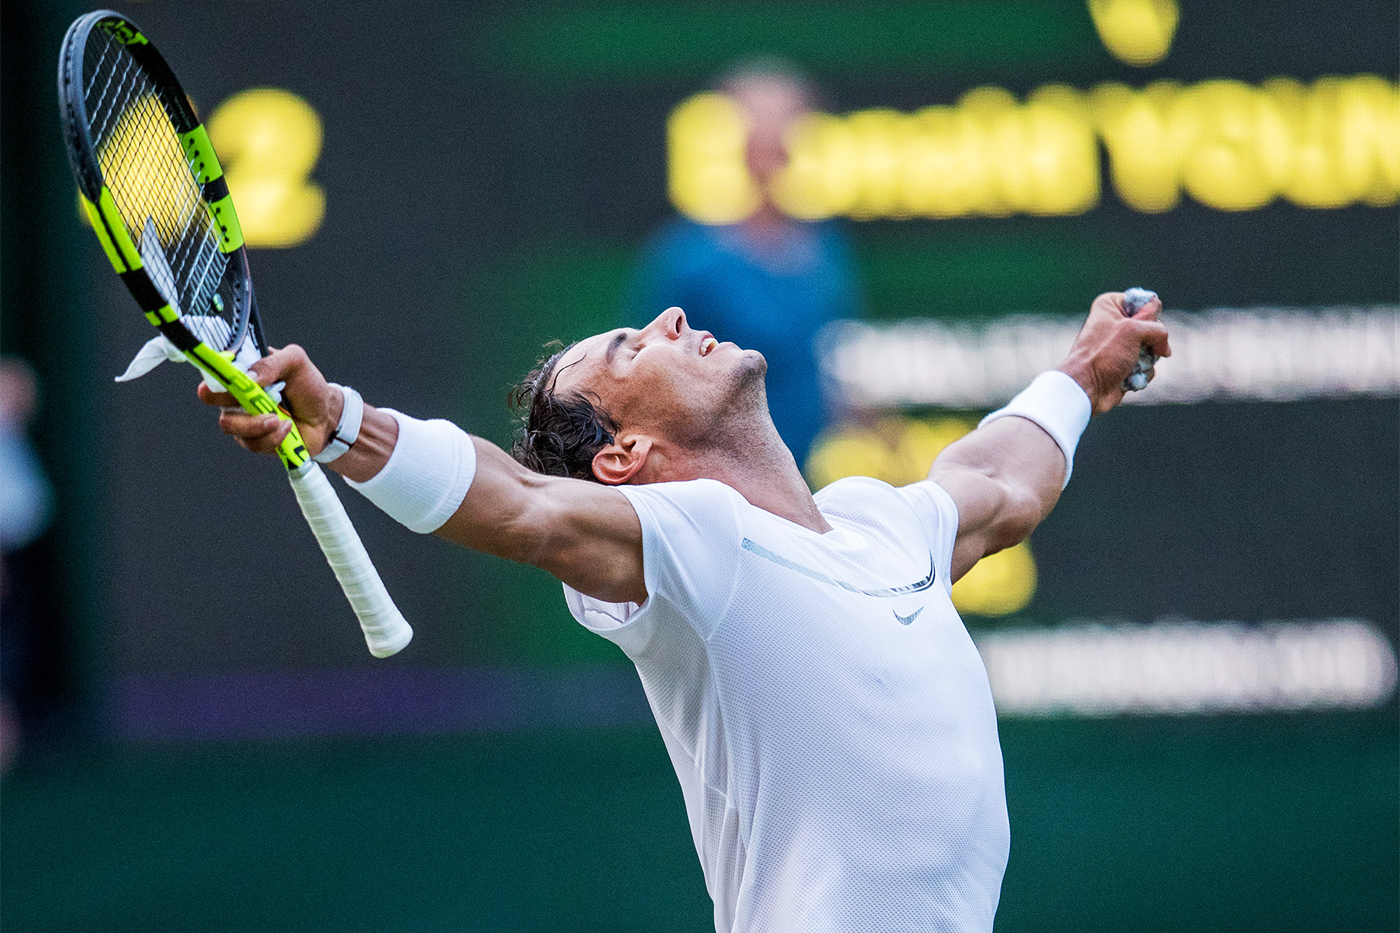 Rafael Nadal avanzó a la segunda ronda de Roland Garros